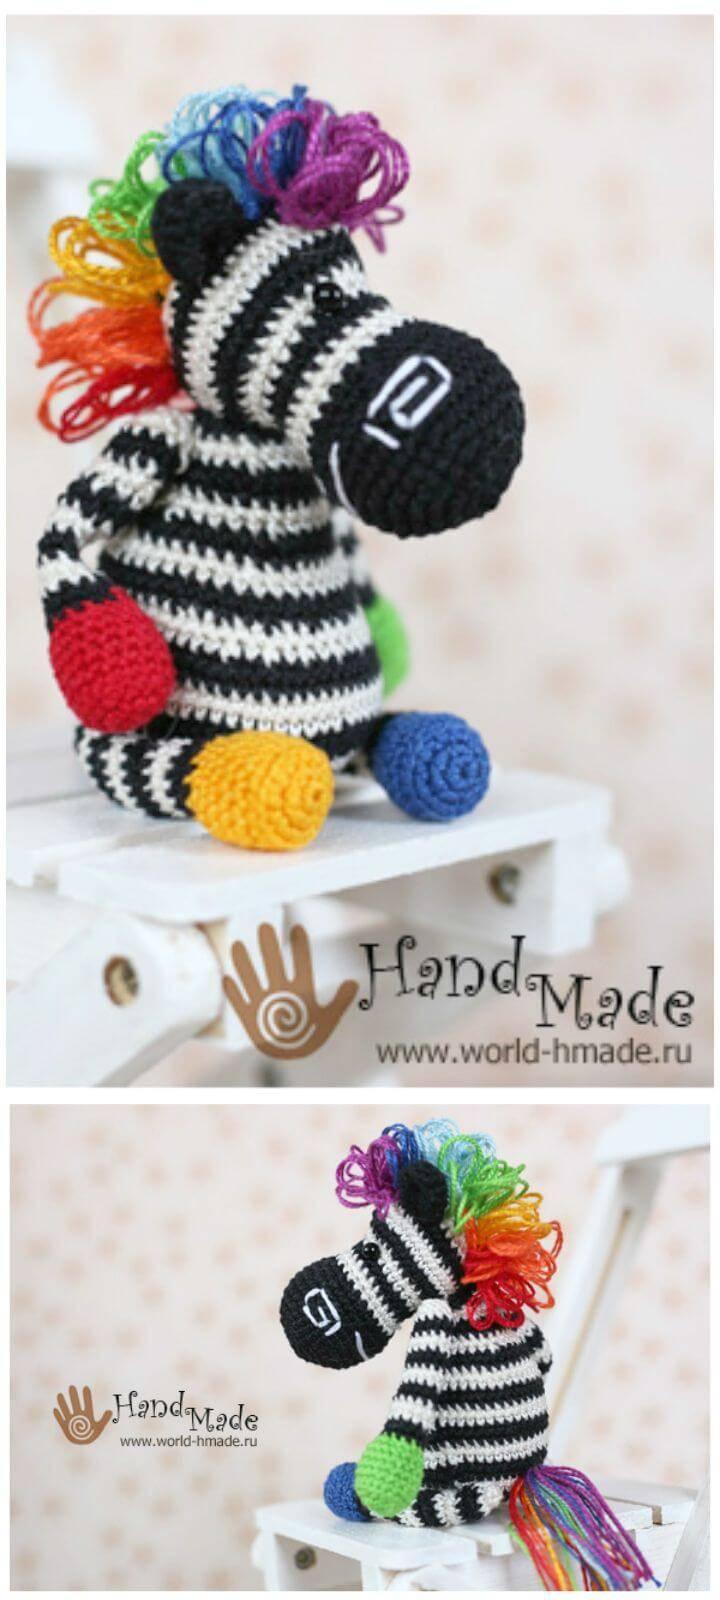 Crochet Zebra Berta With A Rainbow Mane - Free Pattern